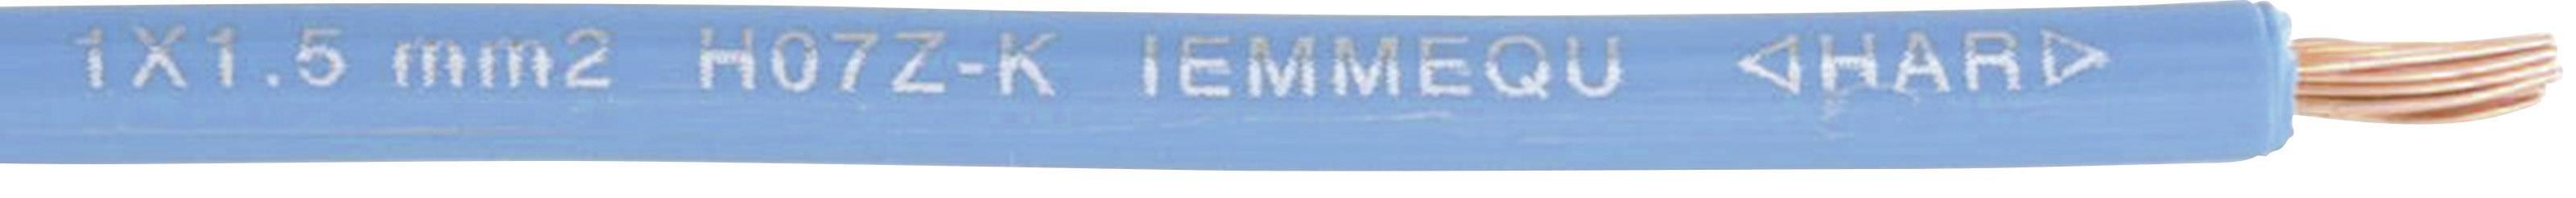 Opletenie / lanko Faber Kabel 040276 H07Z-K, 1 x 4 mm², vonkajší Ø 4.40 mm, 100 m, svetlomodrá